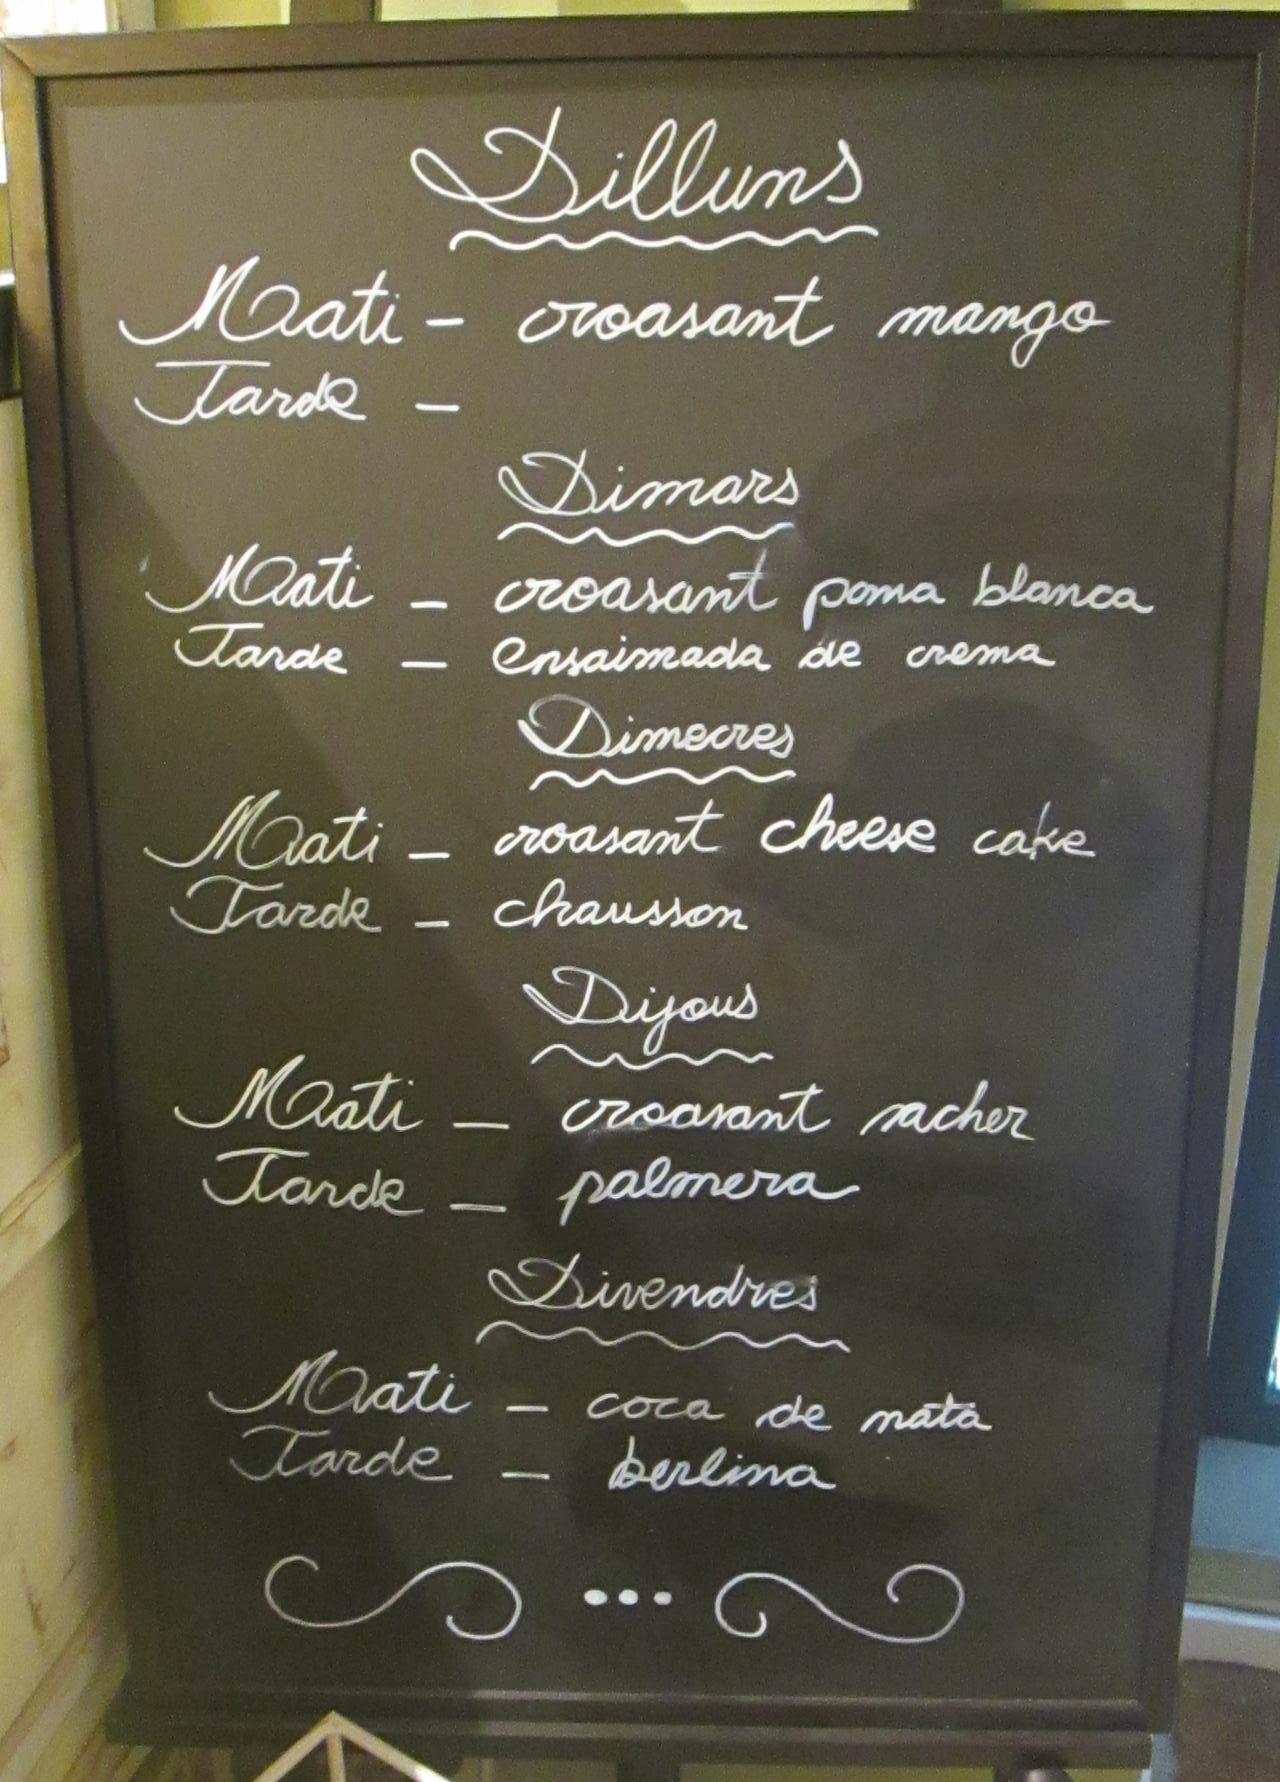 hofmann menu